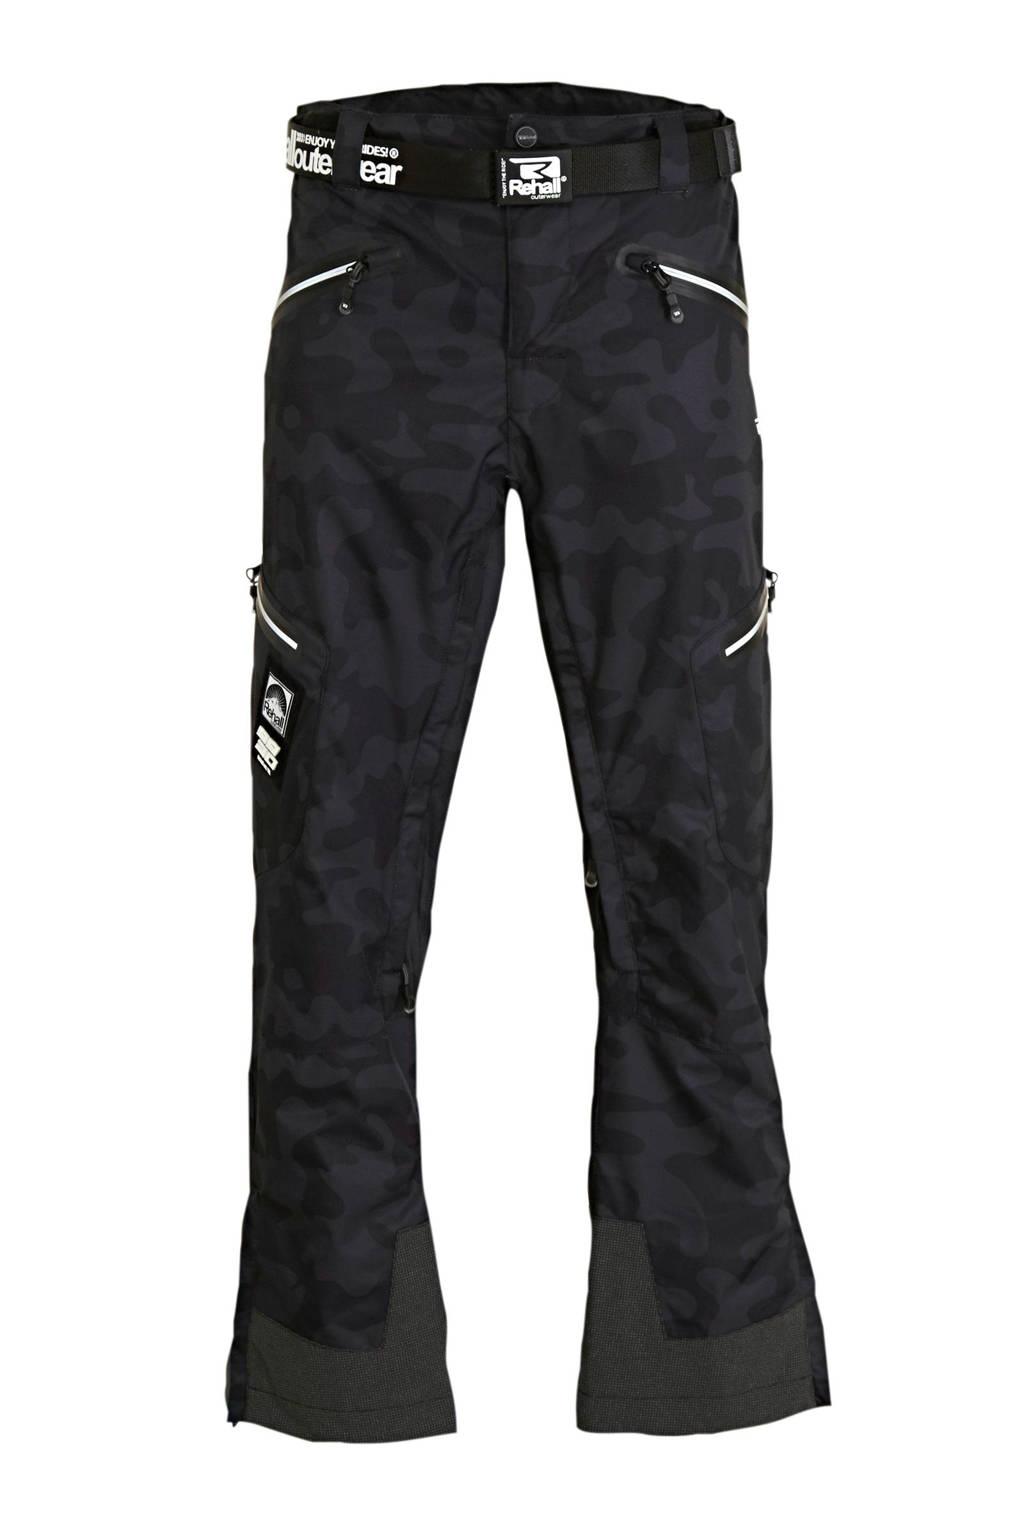 Rehall skibroek Zane-R zwart, Zwart